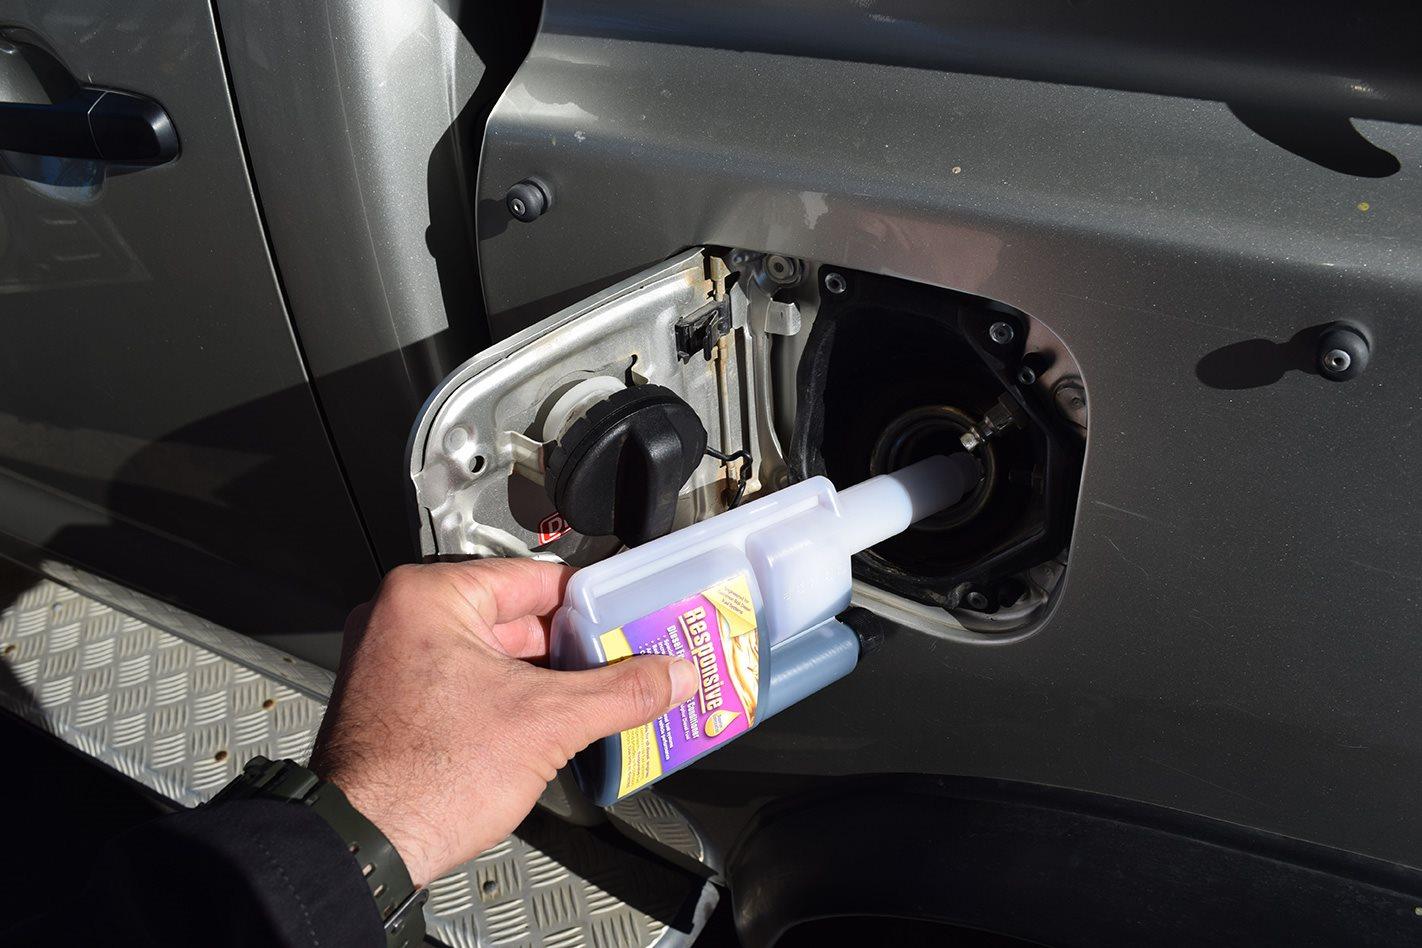 Product test – Oz diesel